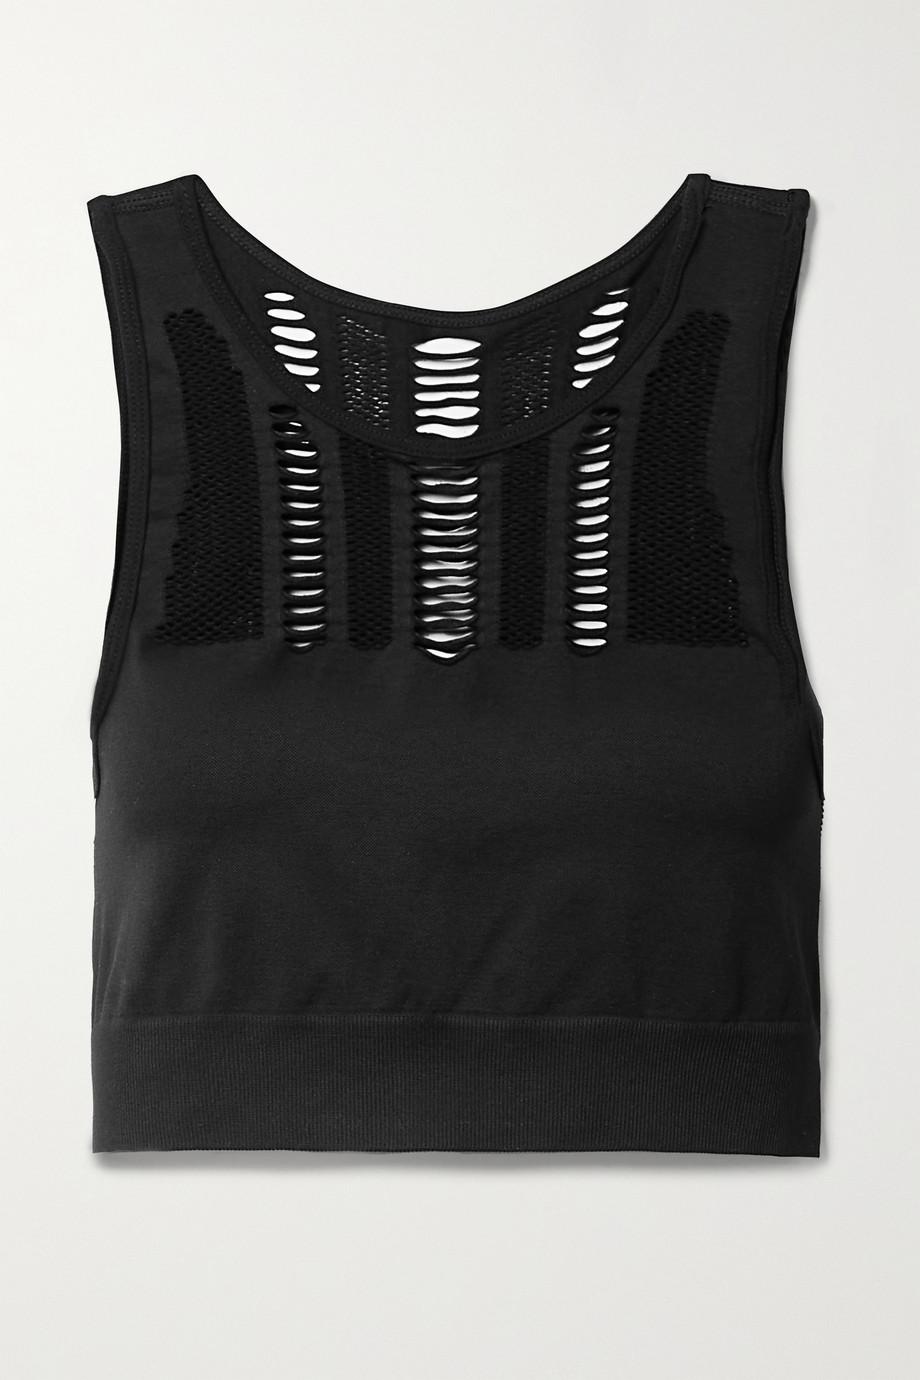 Koral Nada cutout stretch sports bra